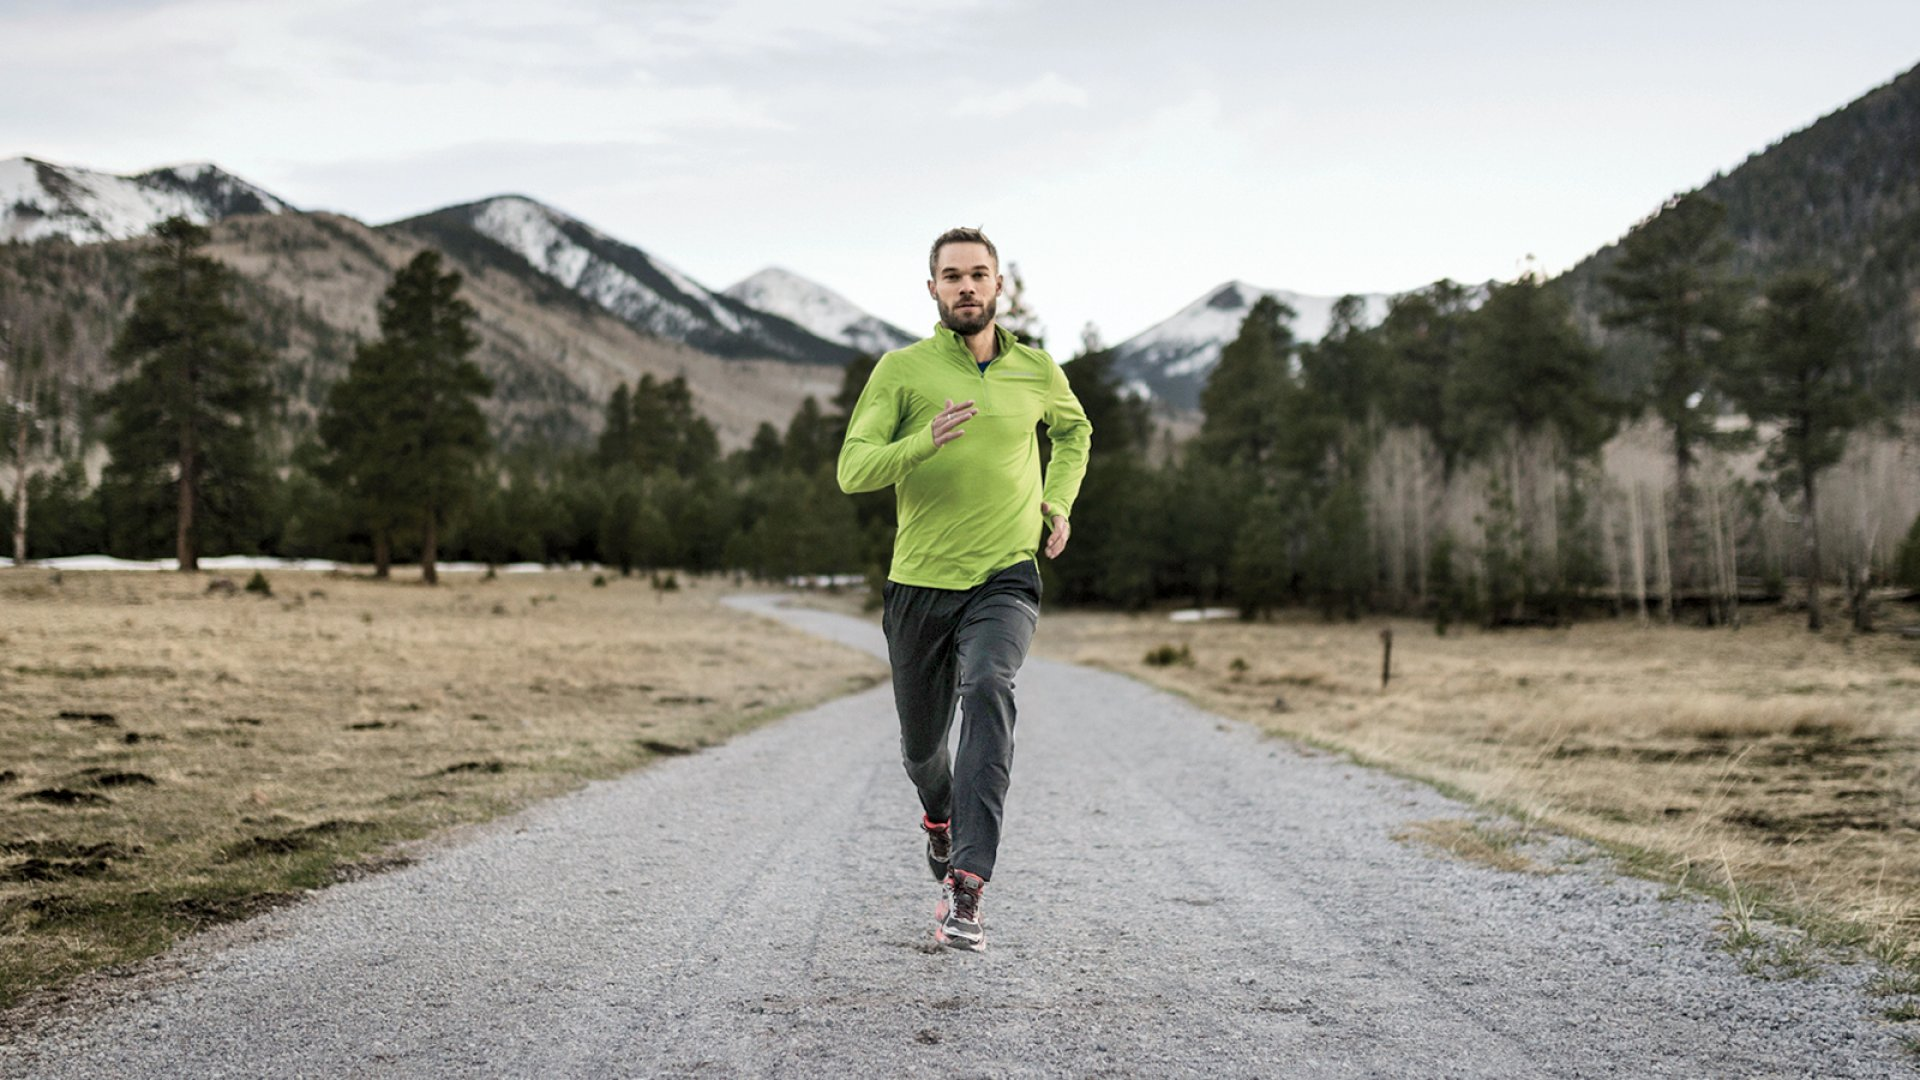 Olympian runner Nick Symmonds.